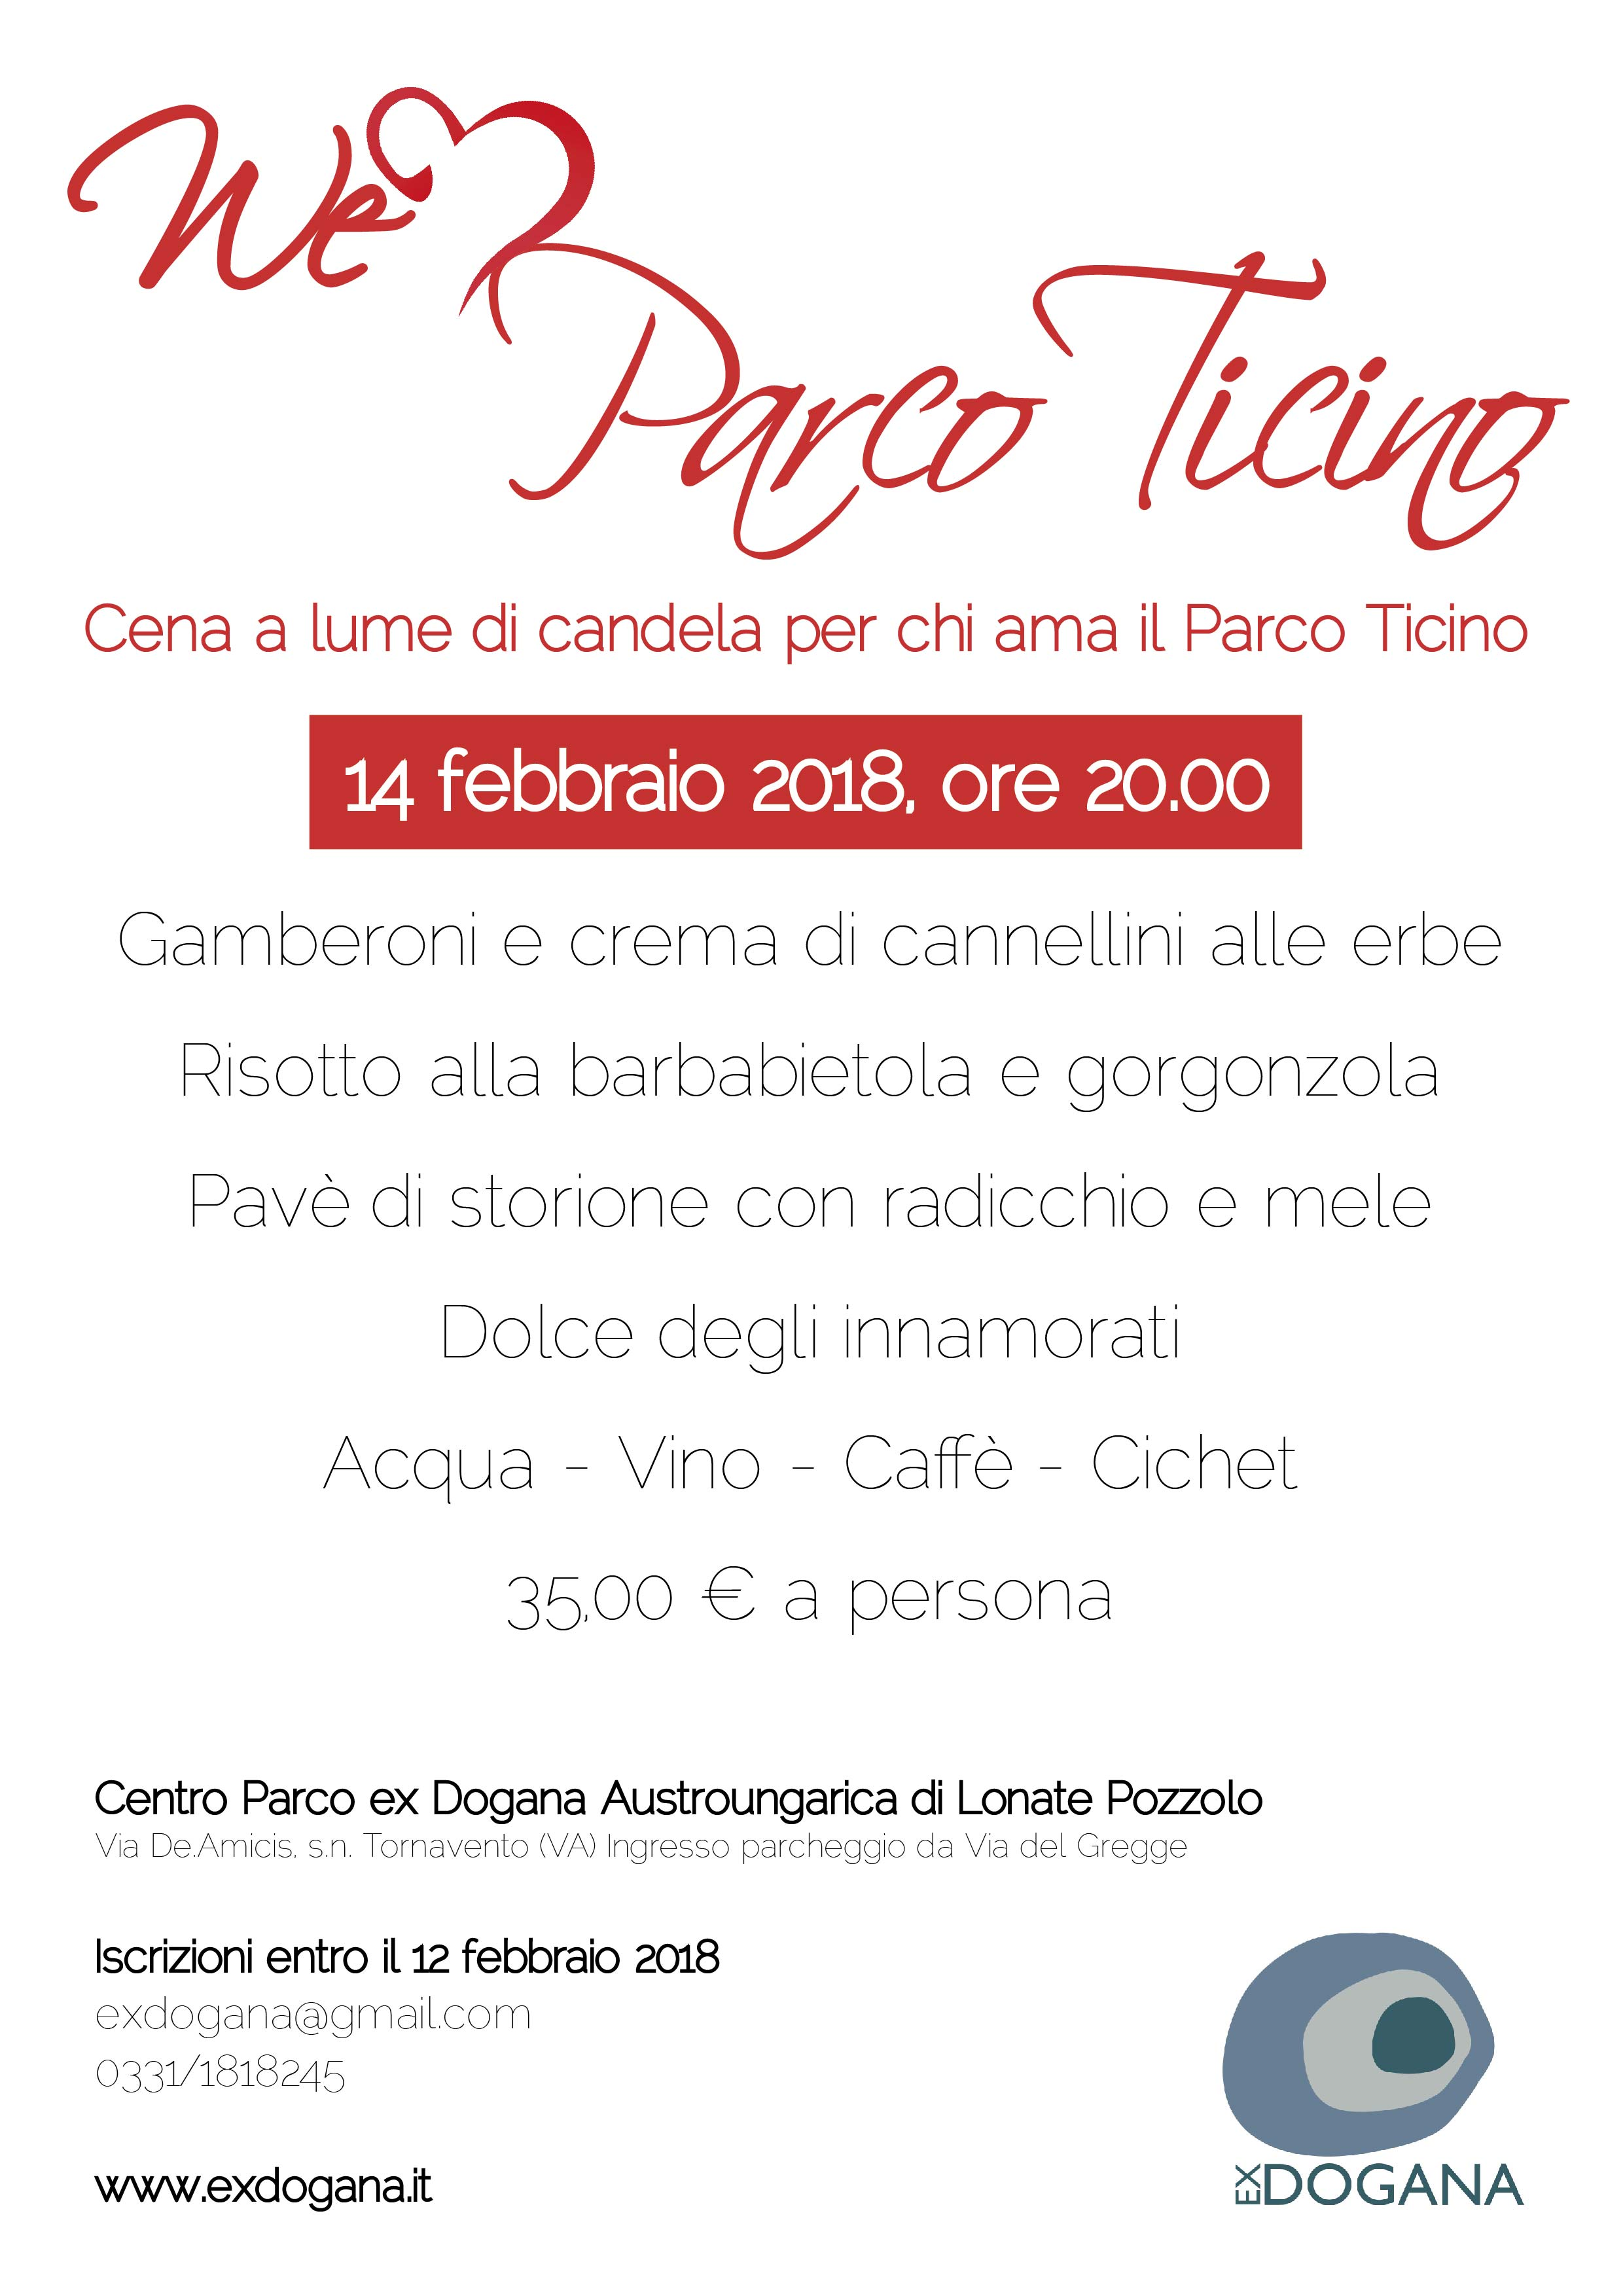 welove_parco_ticino-01